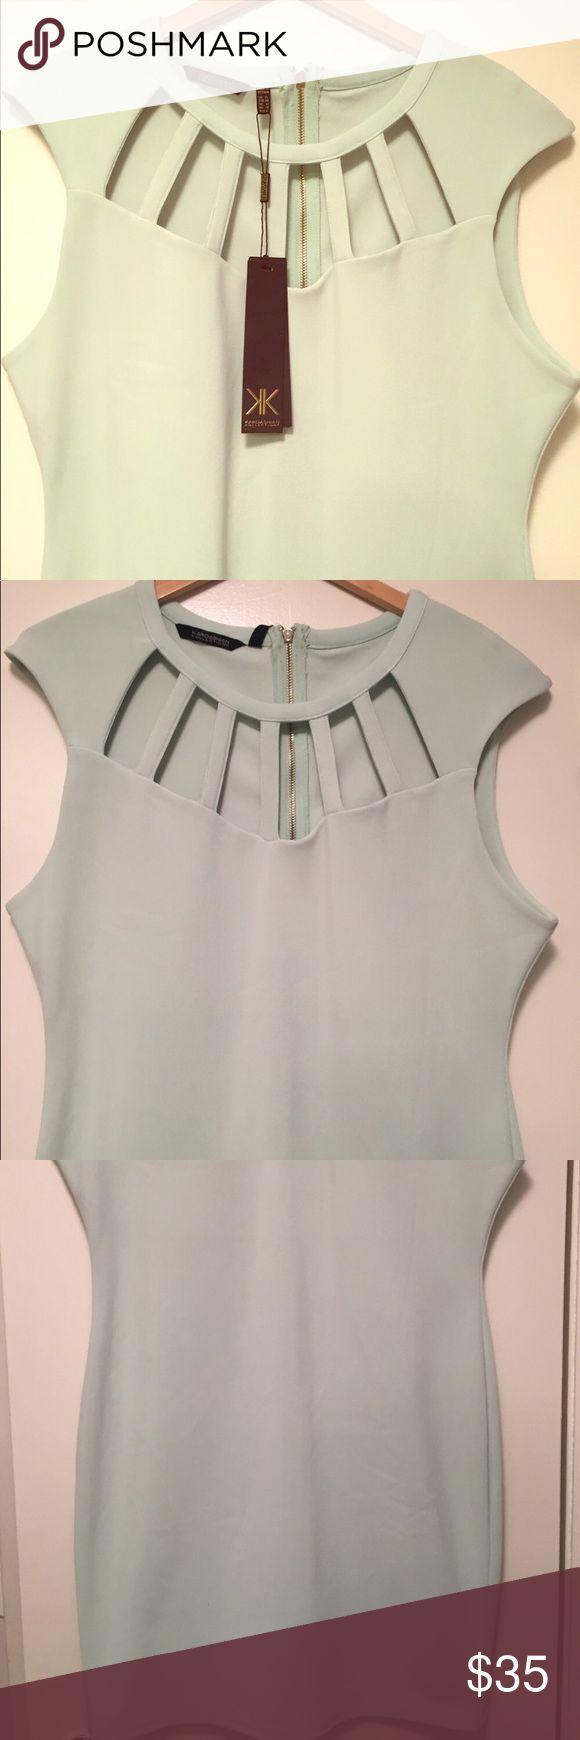 NWT Mint Kardashian Kollection Dress Mint colored, cage neckline. Never worn. Kardashian Kollection Dresses